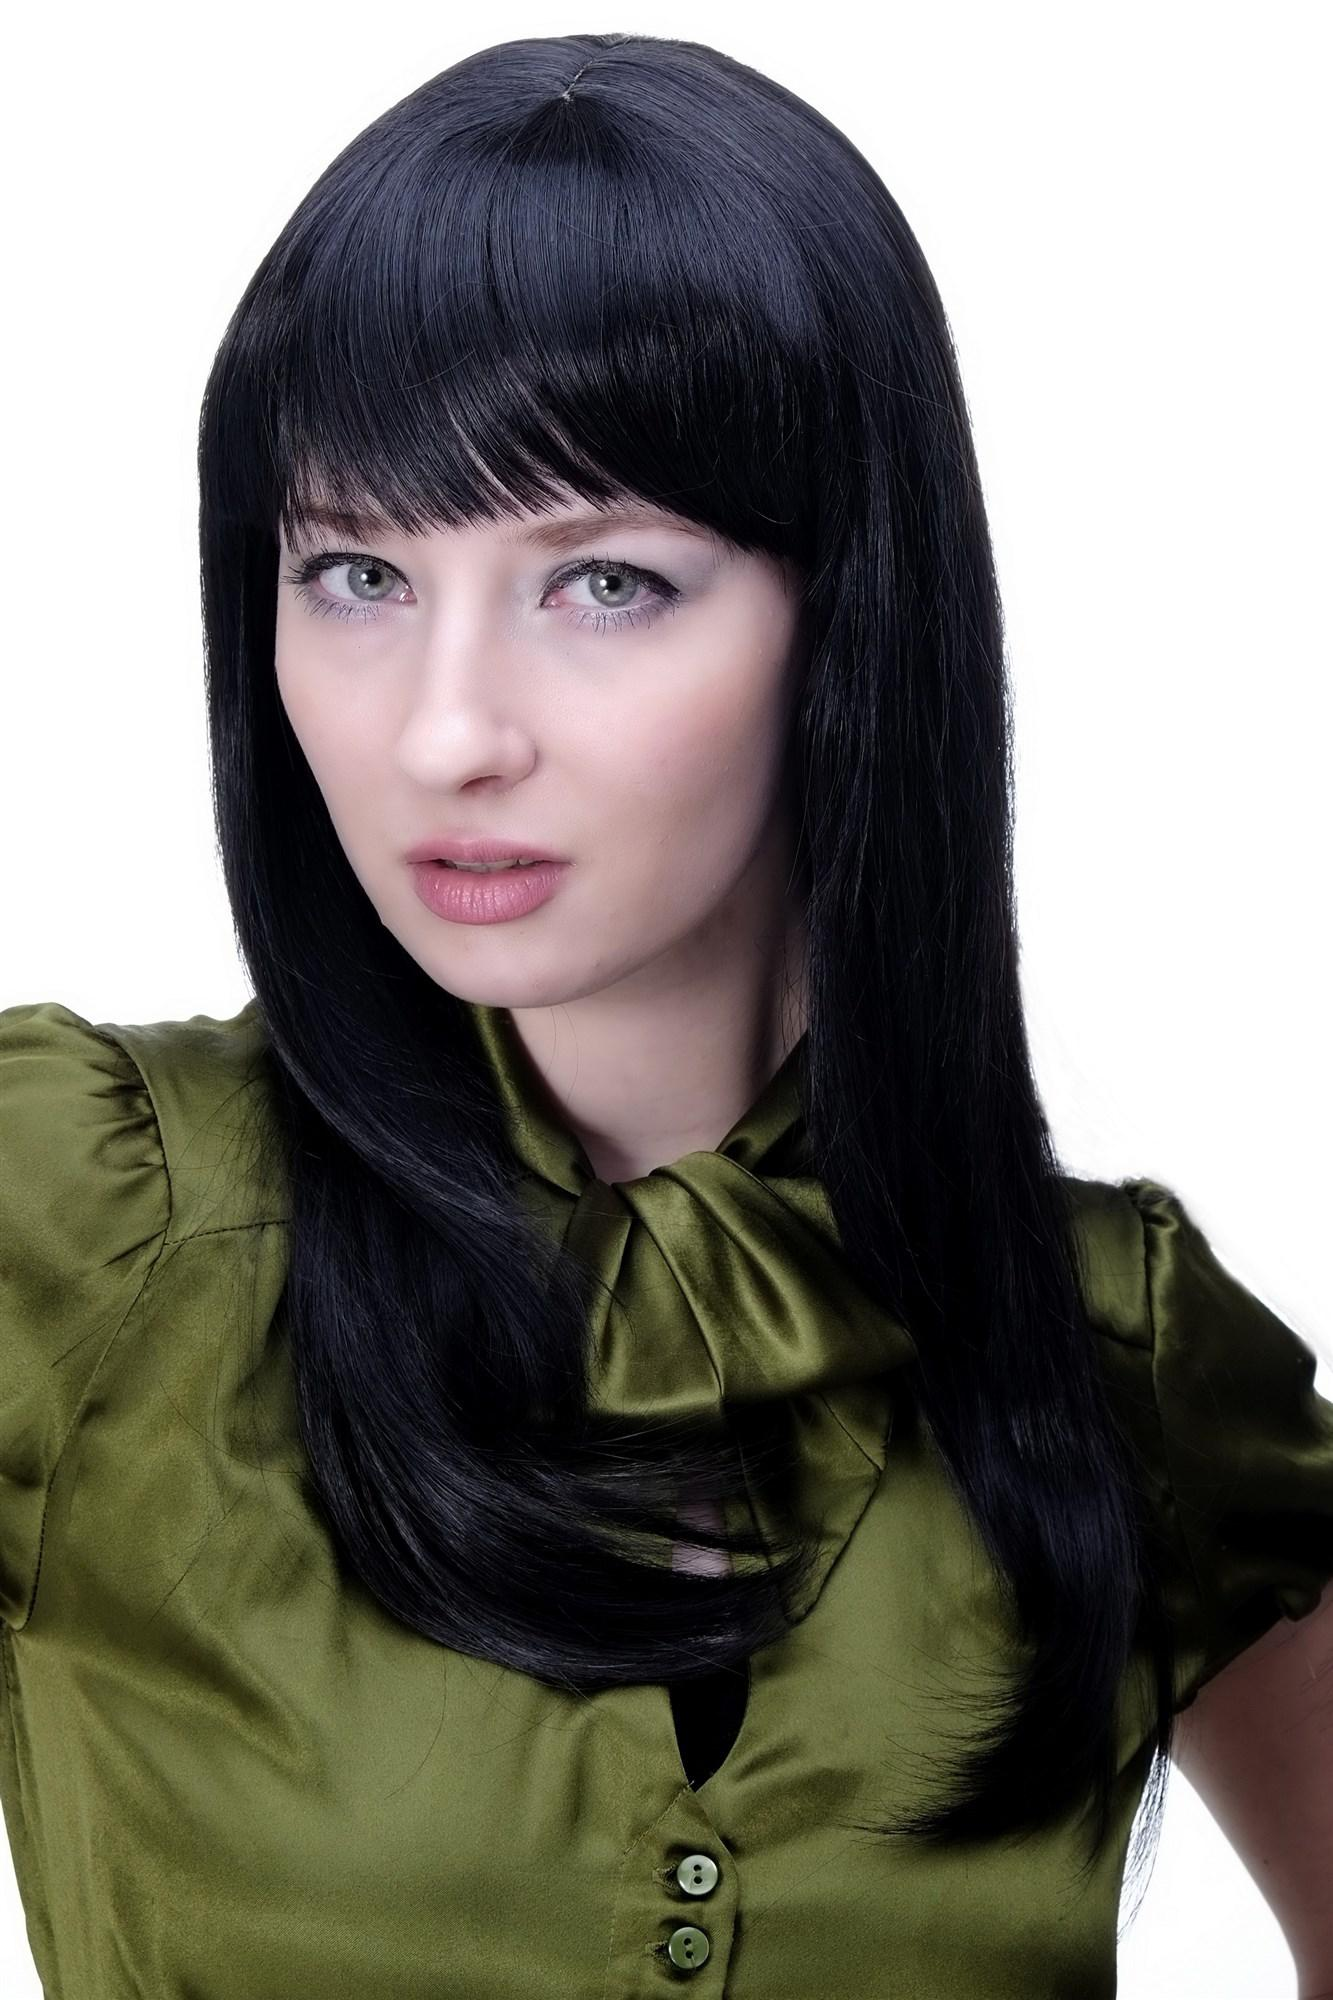 Damenperücke Schwarz Gothic Niedlich Frech Pony Glattes Haar Lang